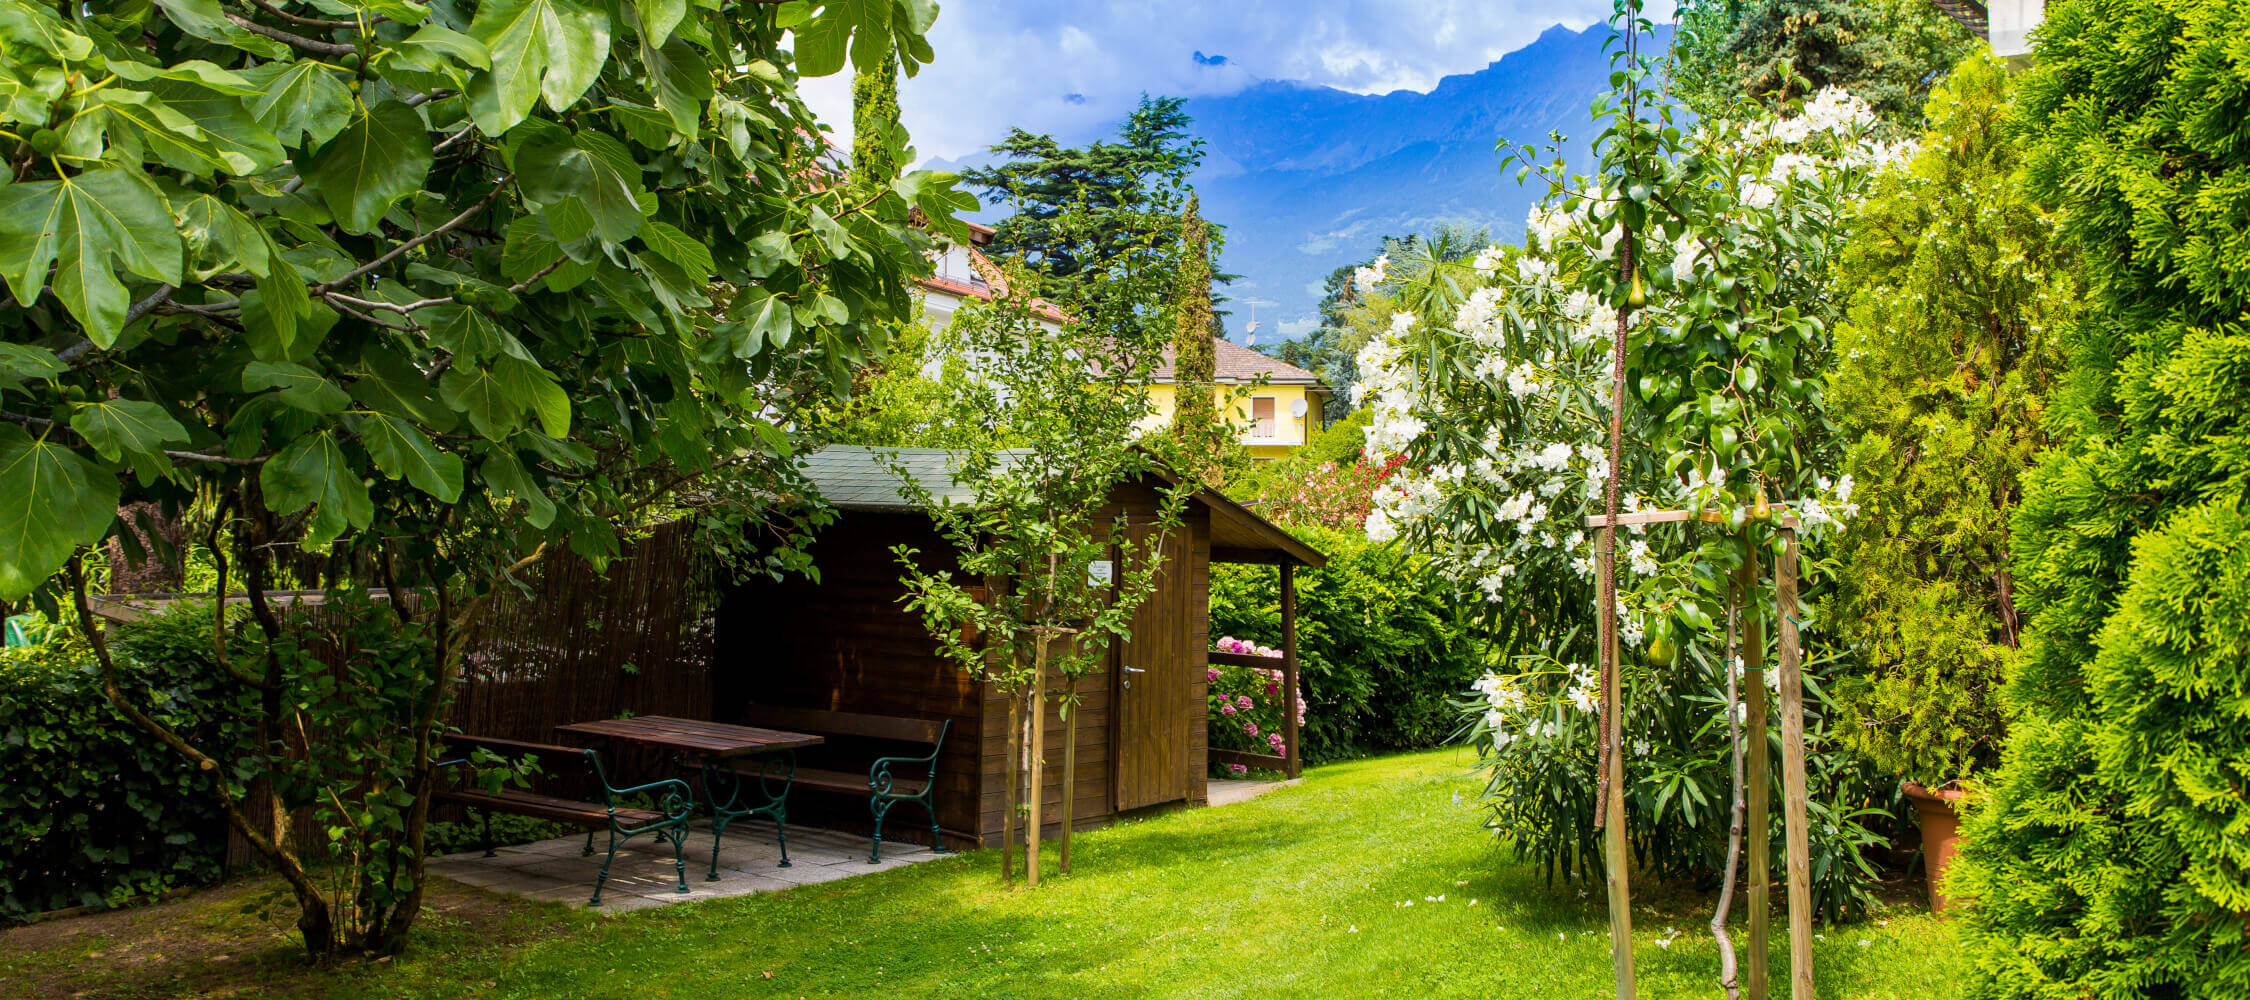 Hotel-Villa-Laurus-Merano-Garten-Detail-Anguane-6824-2250x1000